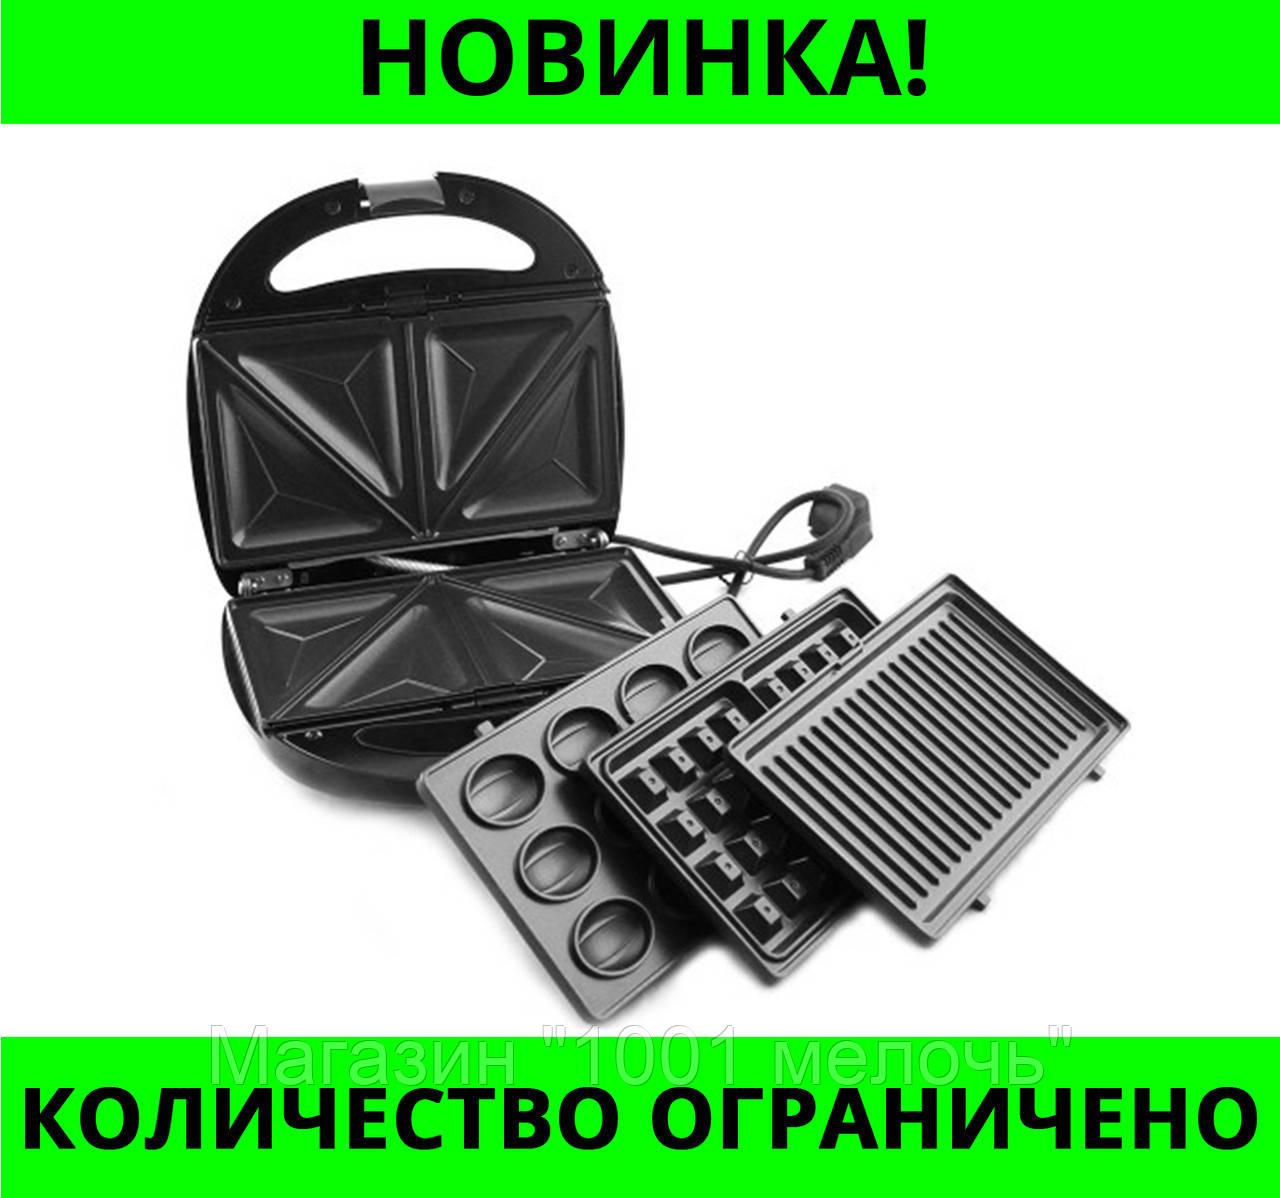 SALE! Сэндвичница Domotec MS-7704 (4в1)!Розница и Опт